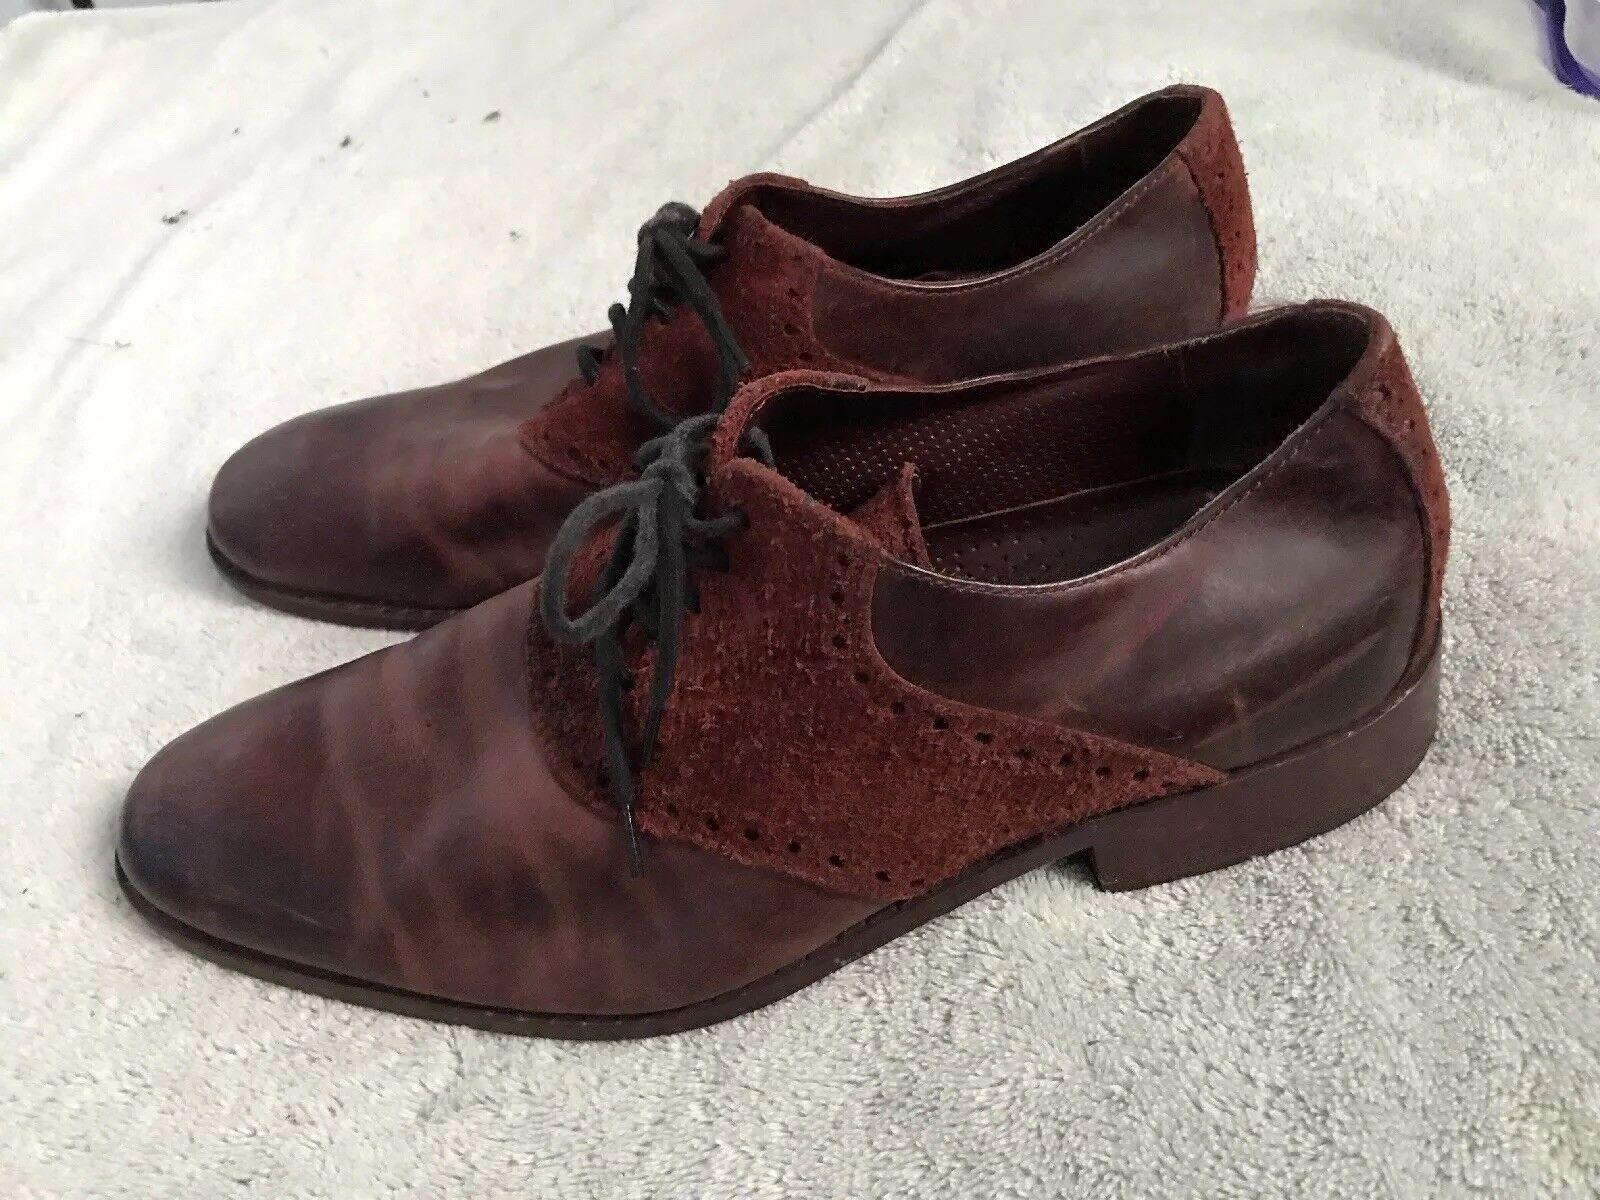 Cole Haan Uomo Brown Suede Pelle Wing Tip Dress Shoes Sz 10M SC8